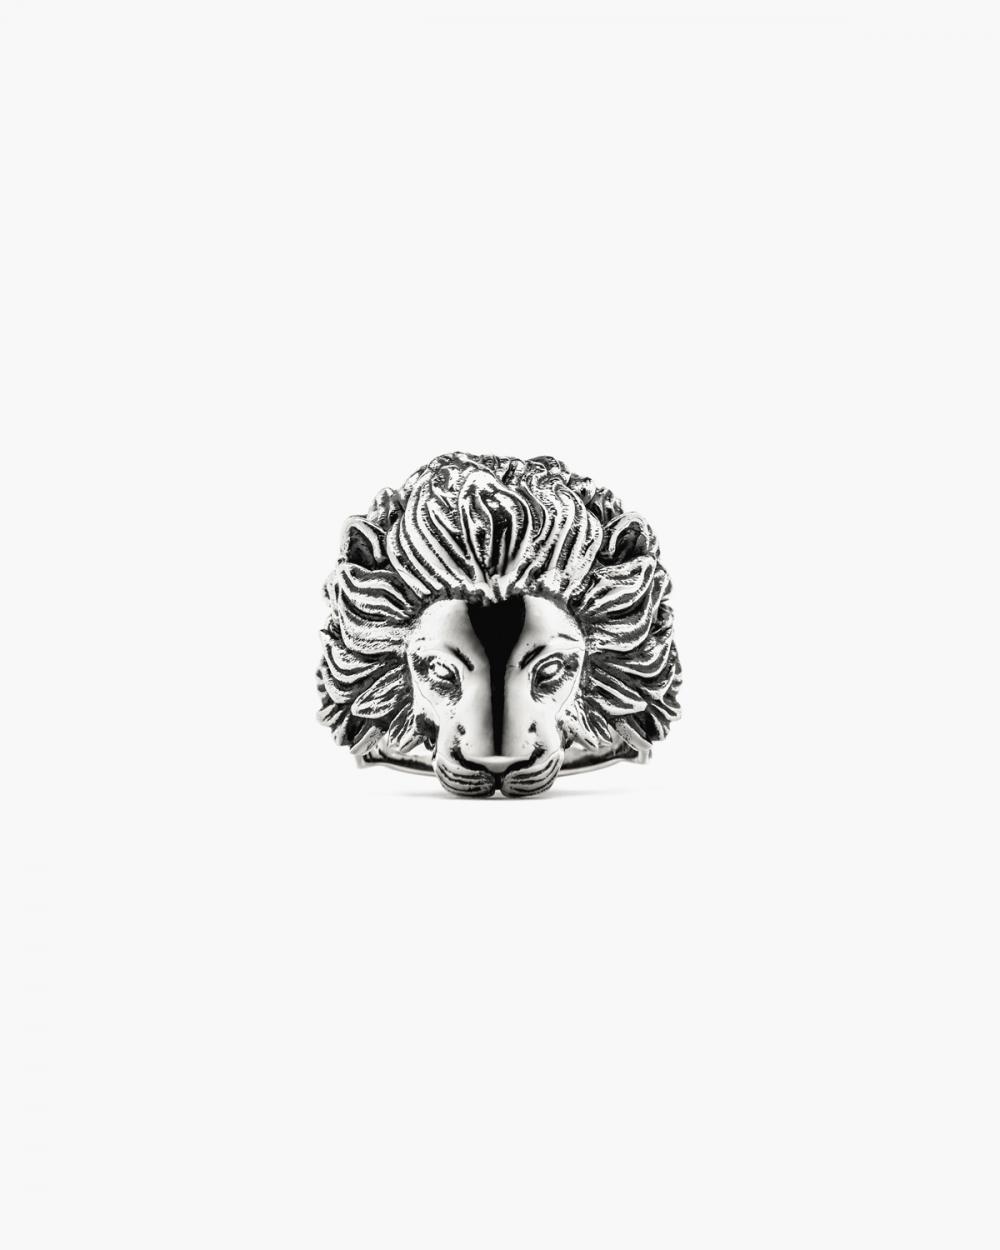 Archive Sale ROARING LION RING NOVE25